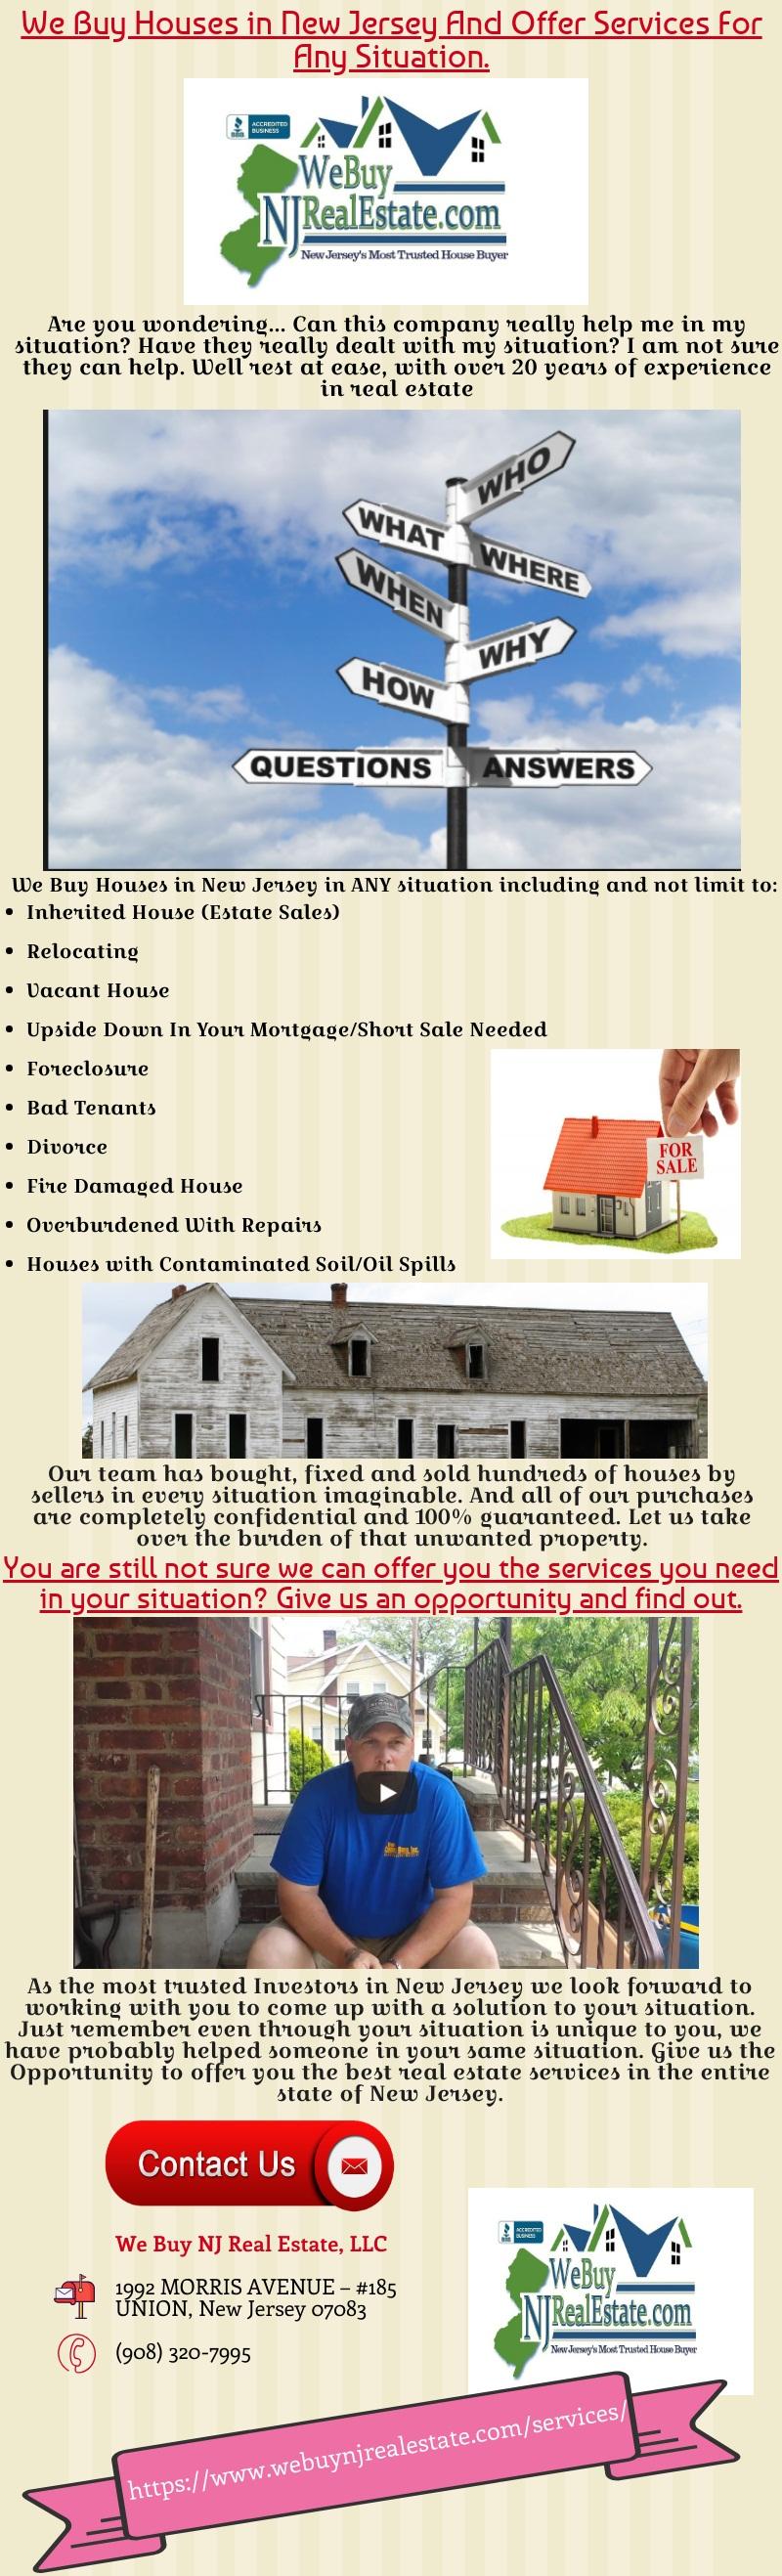 We Buy NJ Real Estate